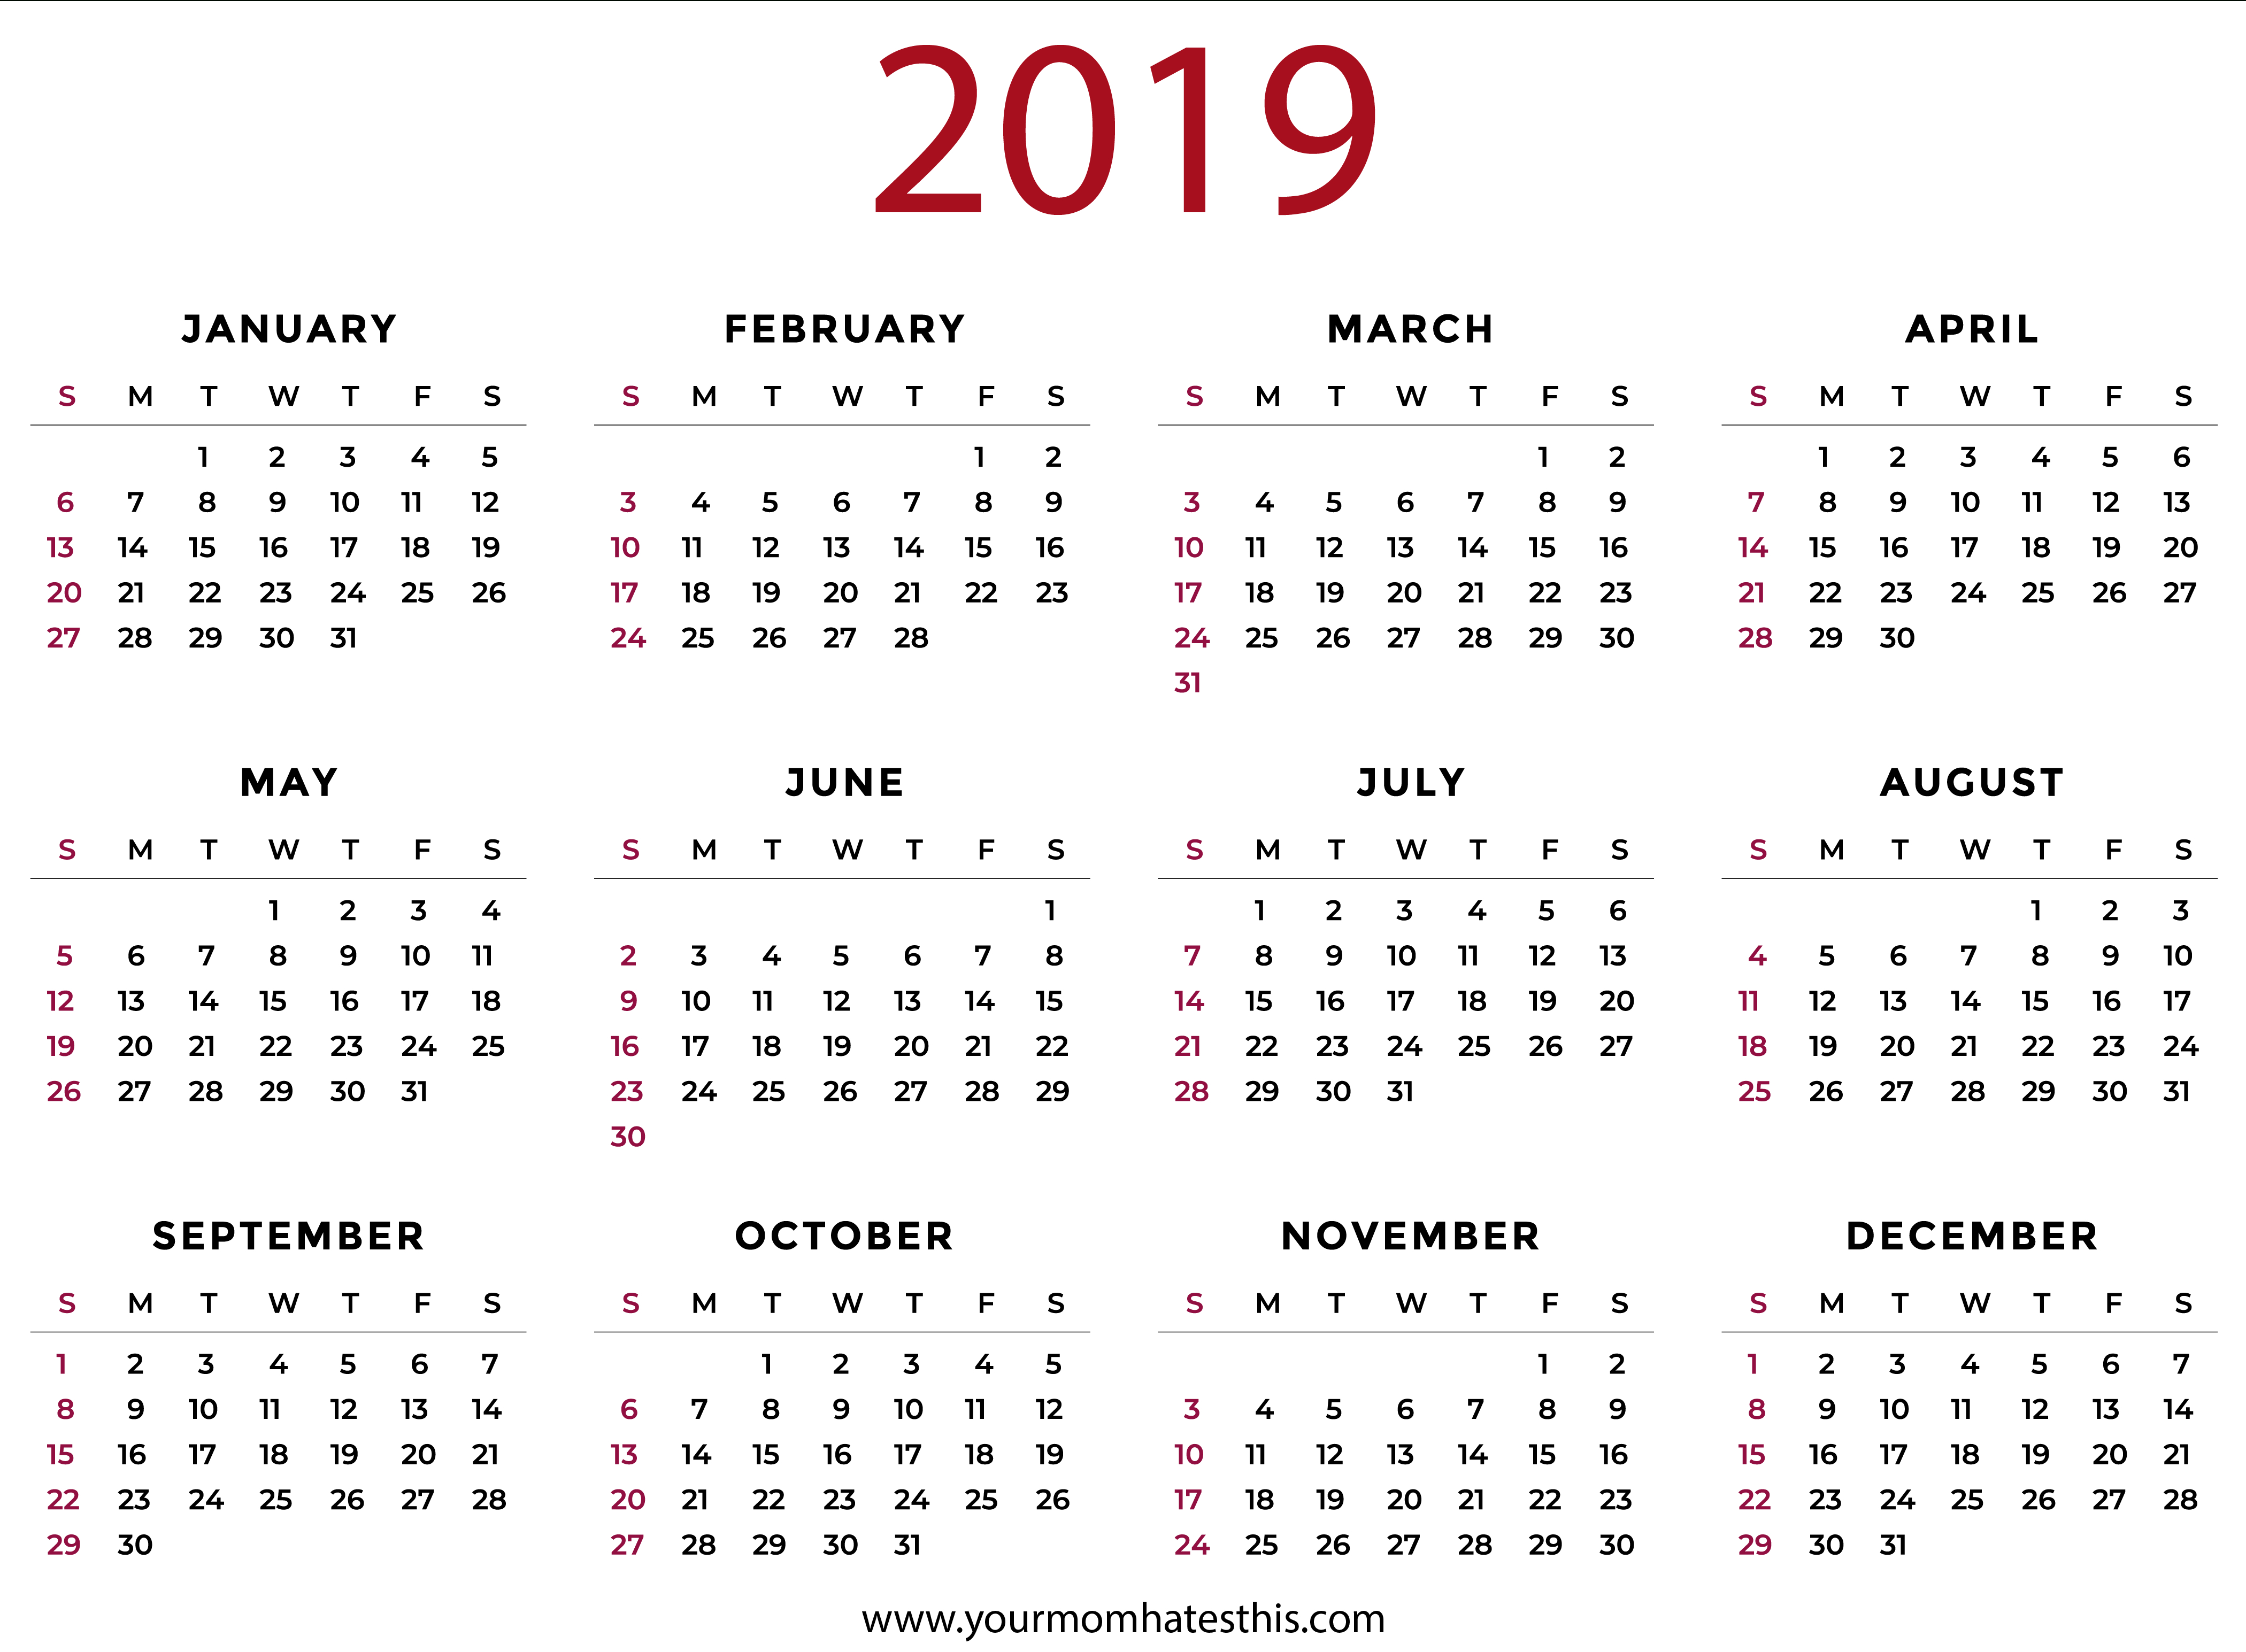 2019 Calendars Download Pdf Templates Calendar Of 2019 Pdf